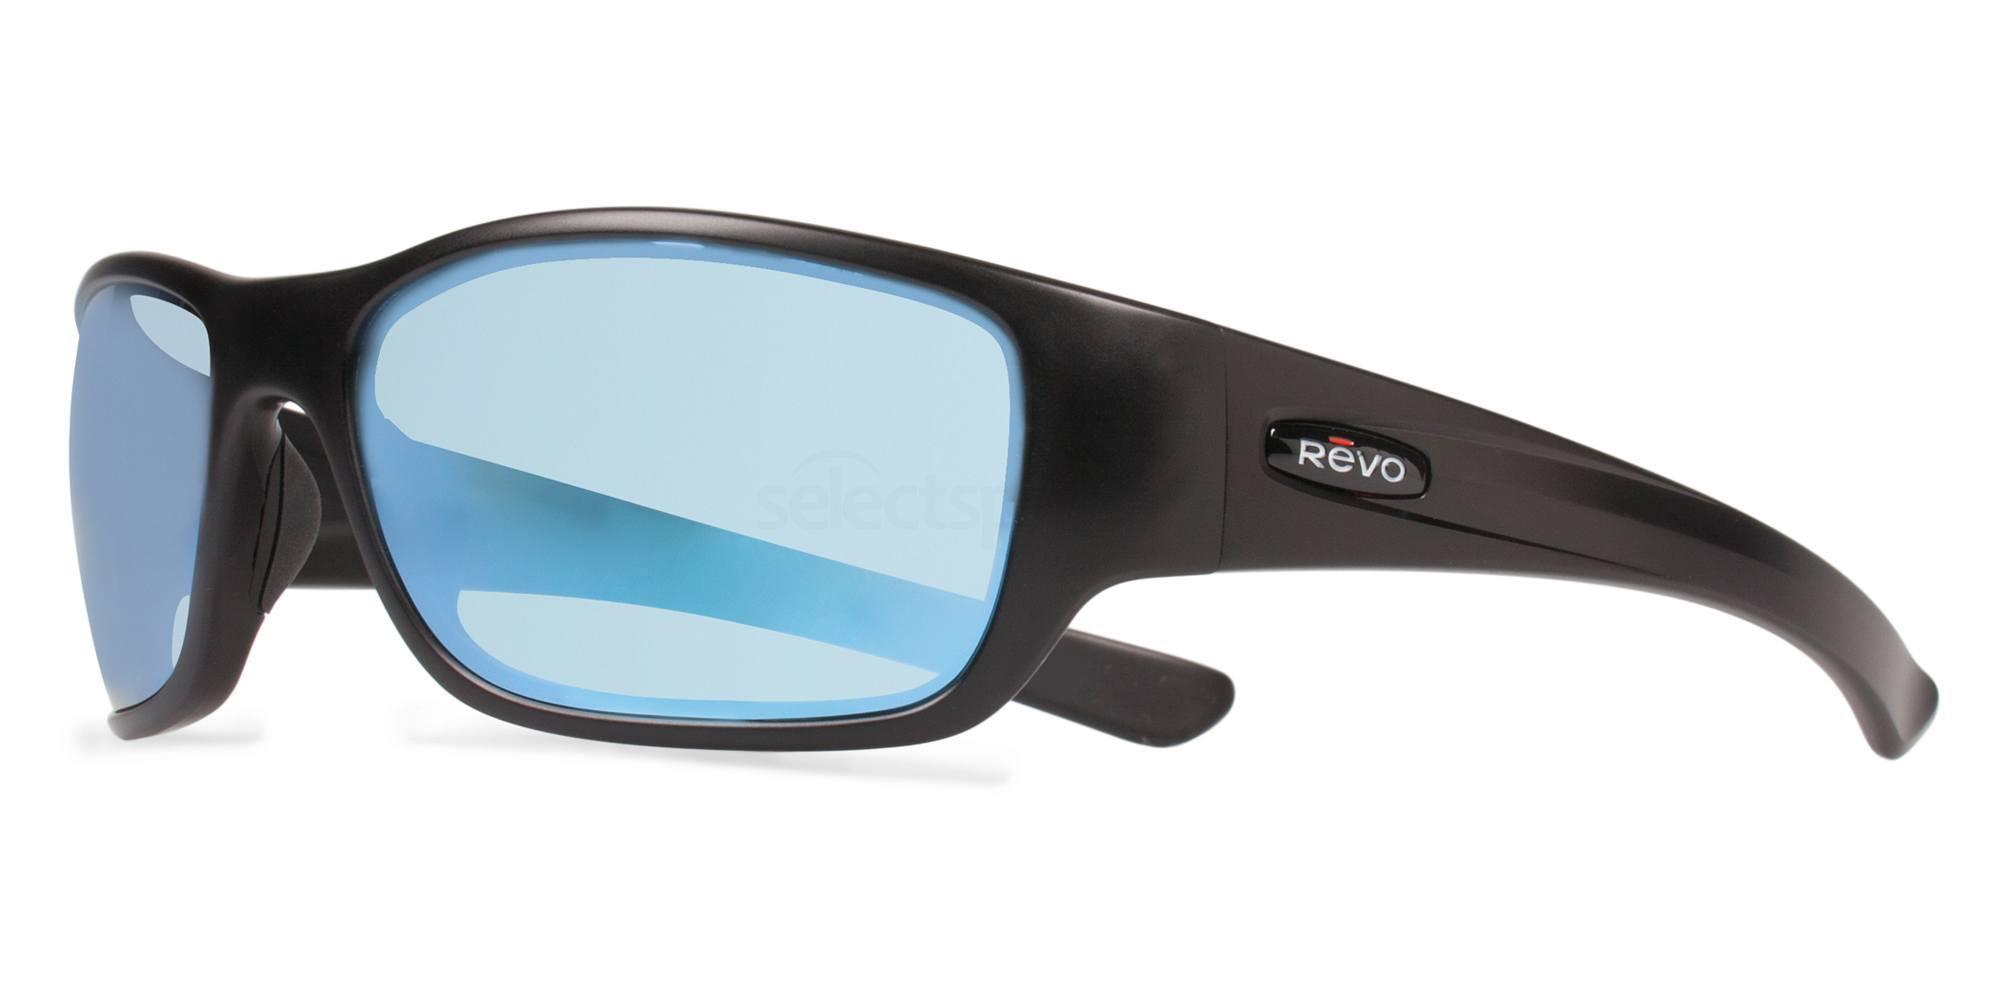 01BL Heading - 354058 Sunglasses, Revo